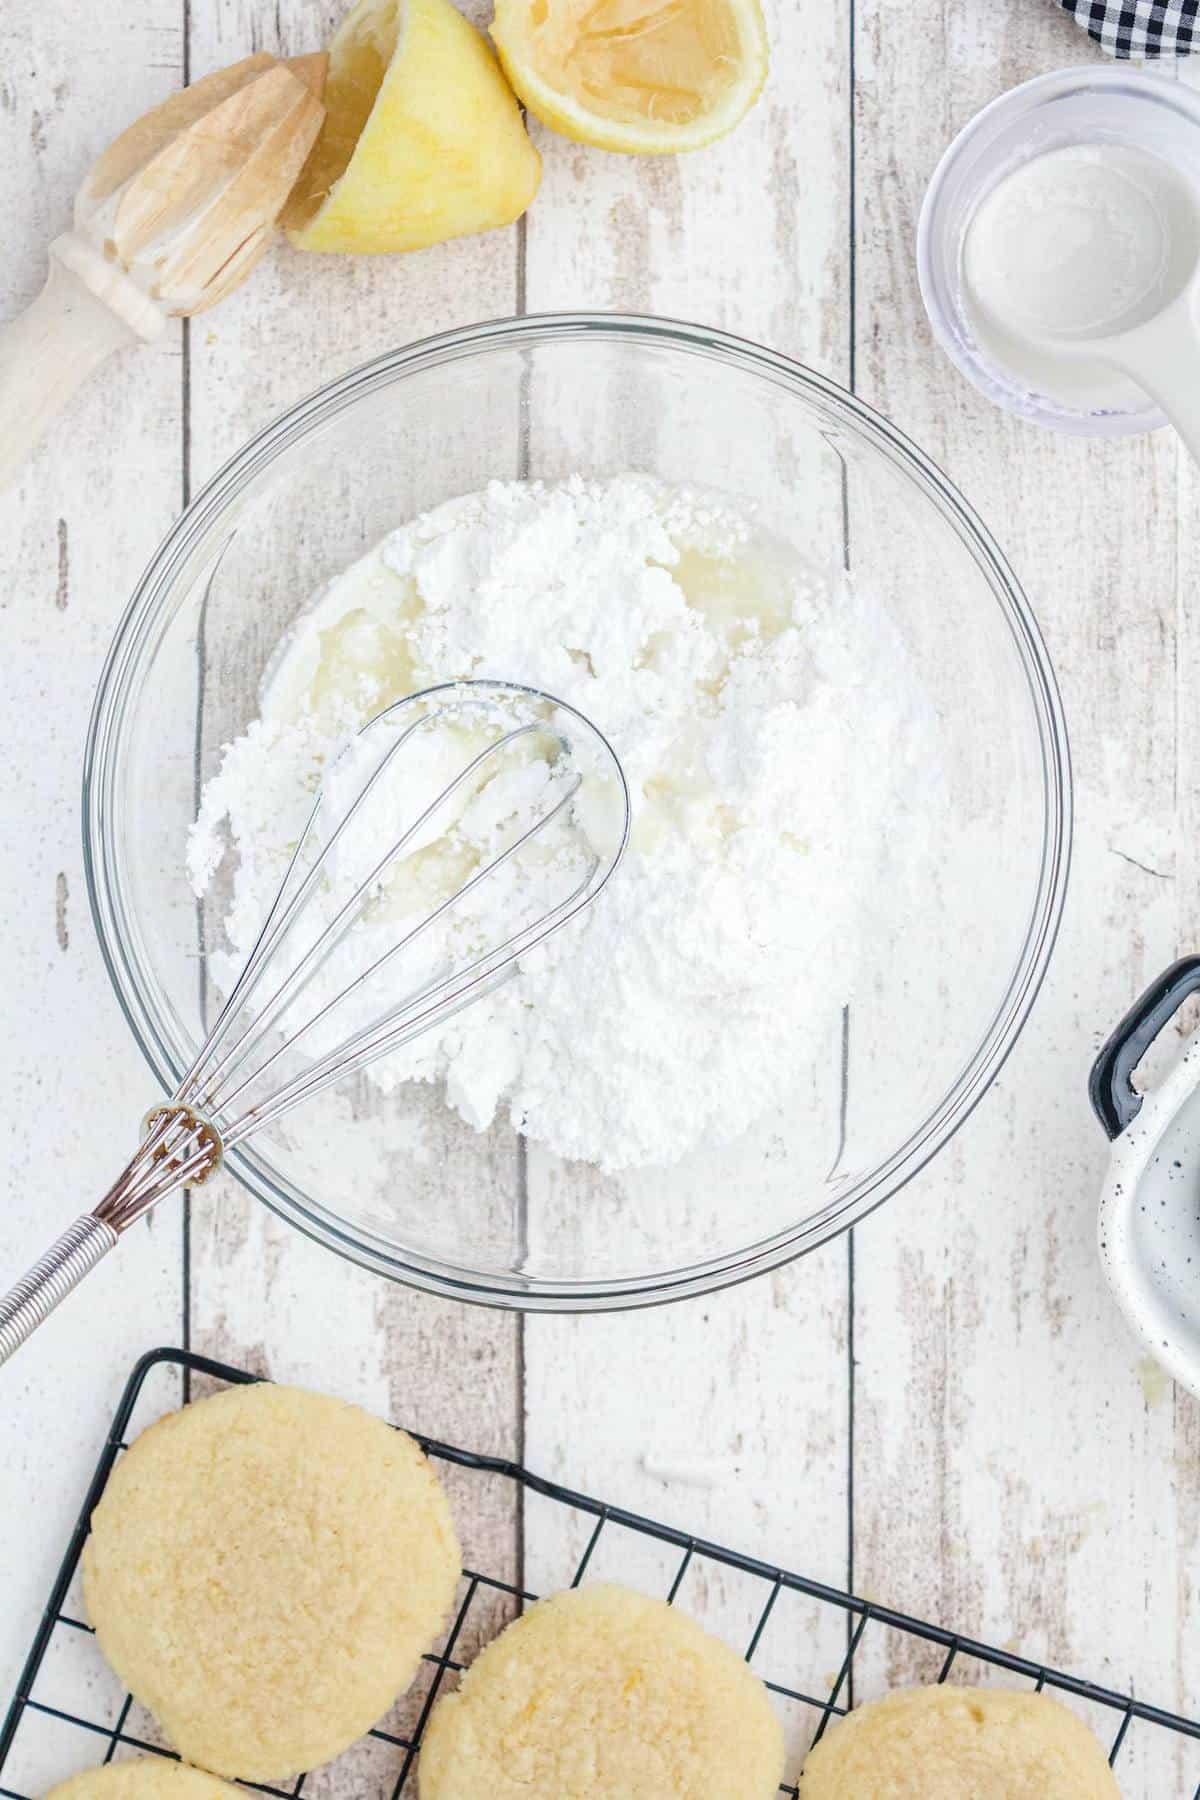 Mix together confectioner's sugar, lemon juice, and cream